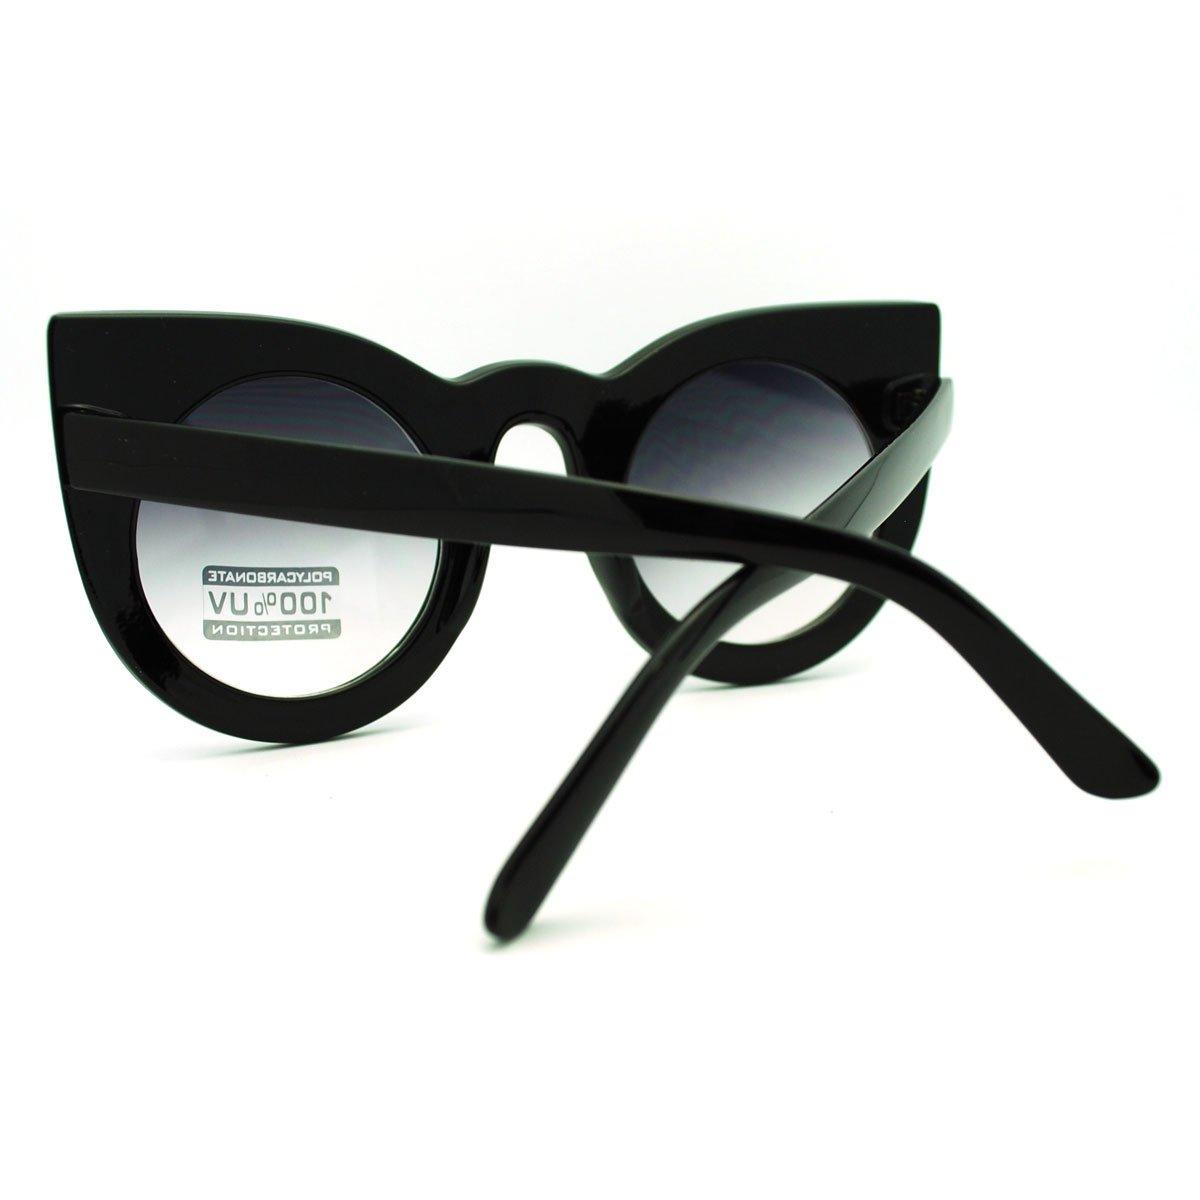 Oversized Round Cateye Sunglasses Womens Vintage Retro Eyewear 3